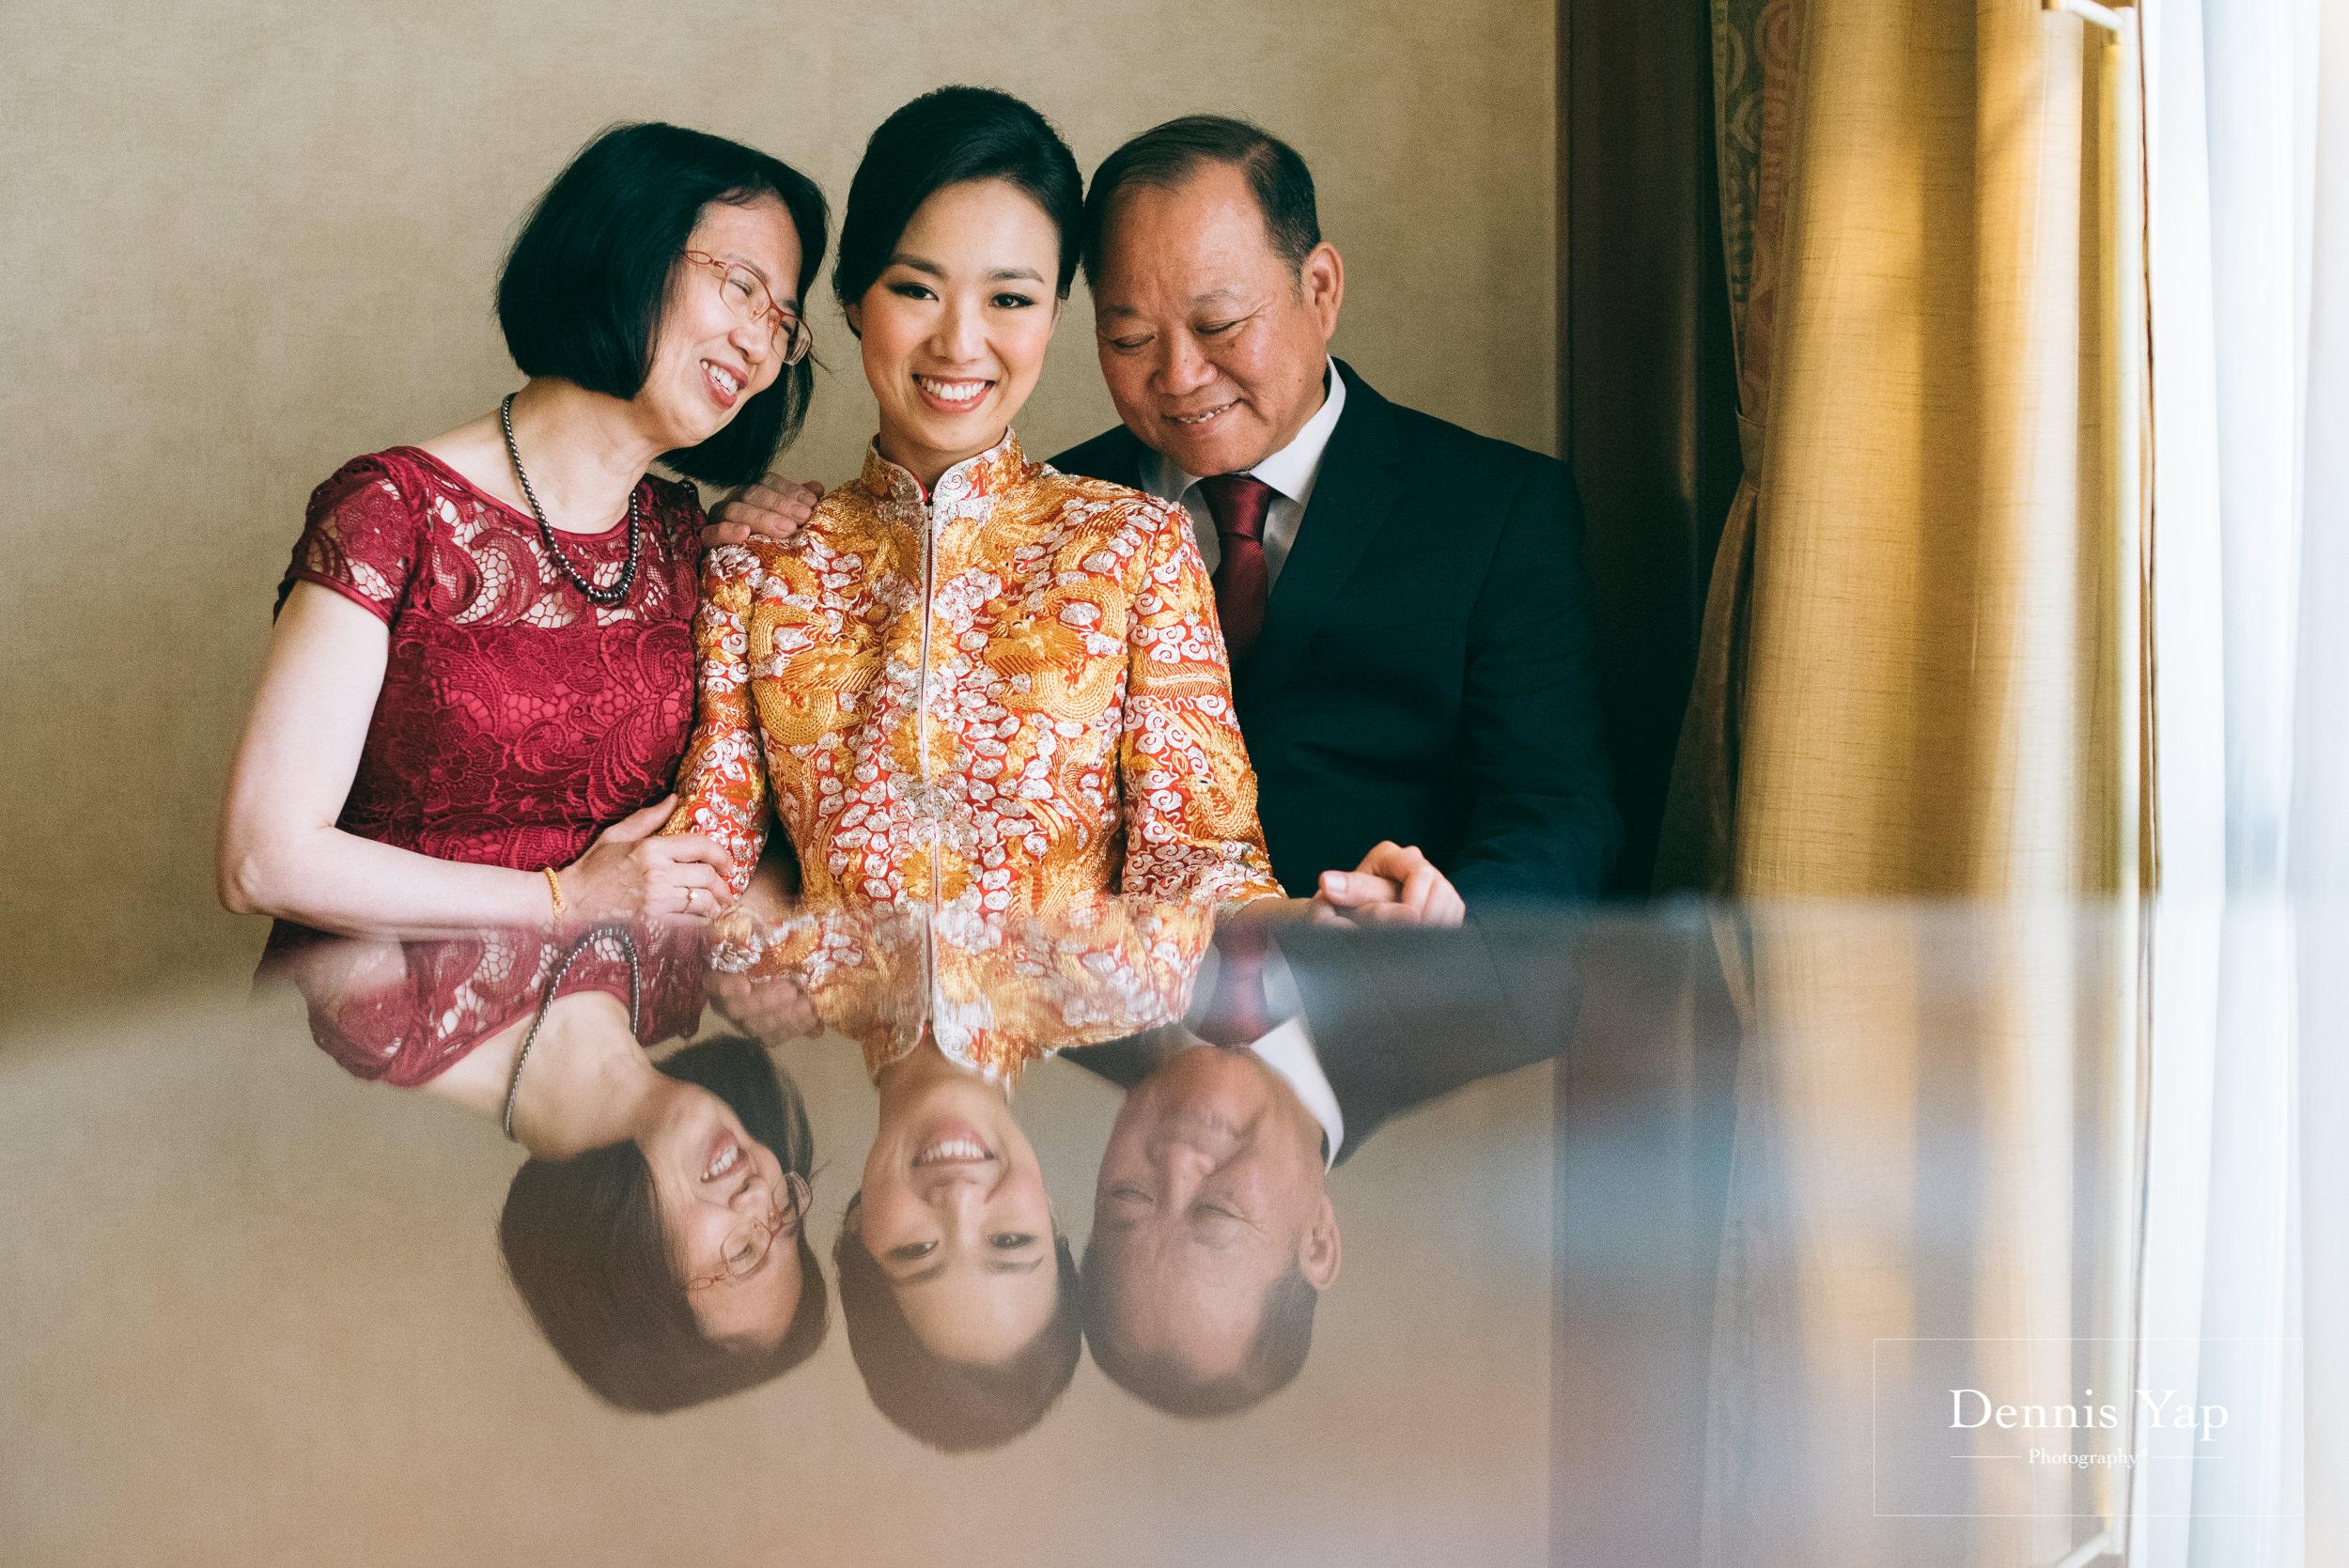 wai keong jenny wedding day bangsar dennis yap photography emotions beloved family-9.jpg